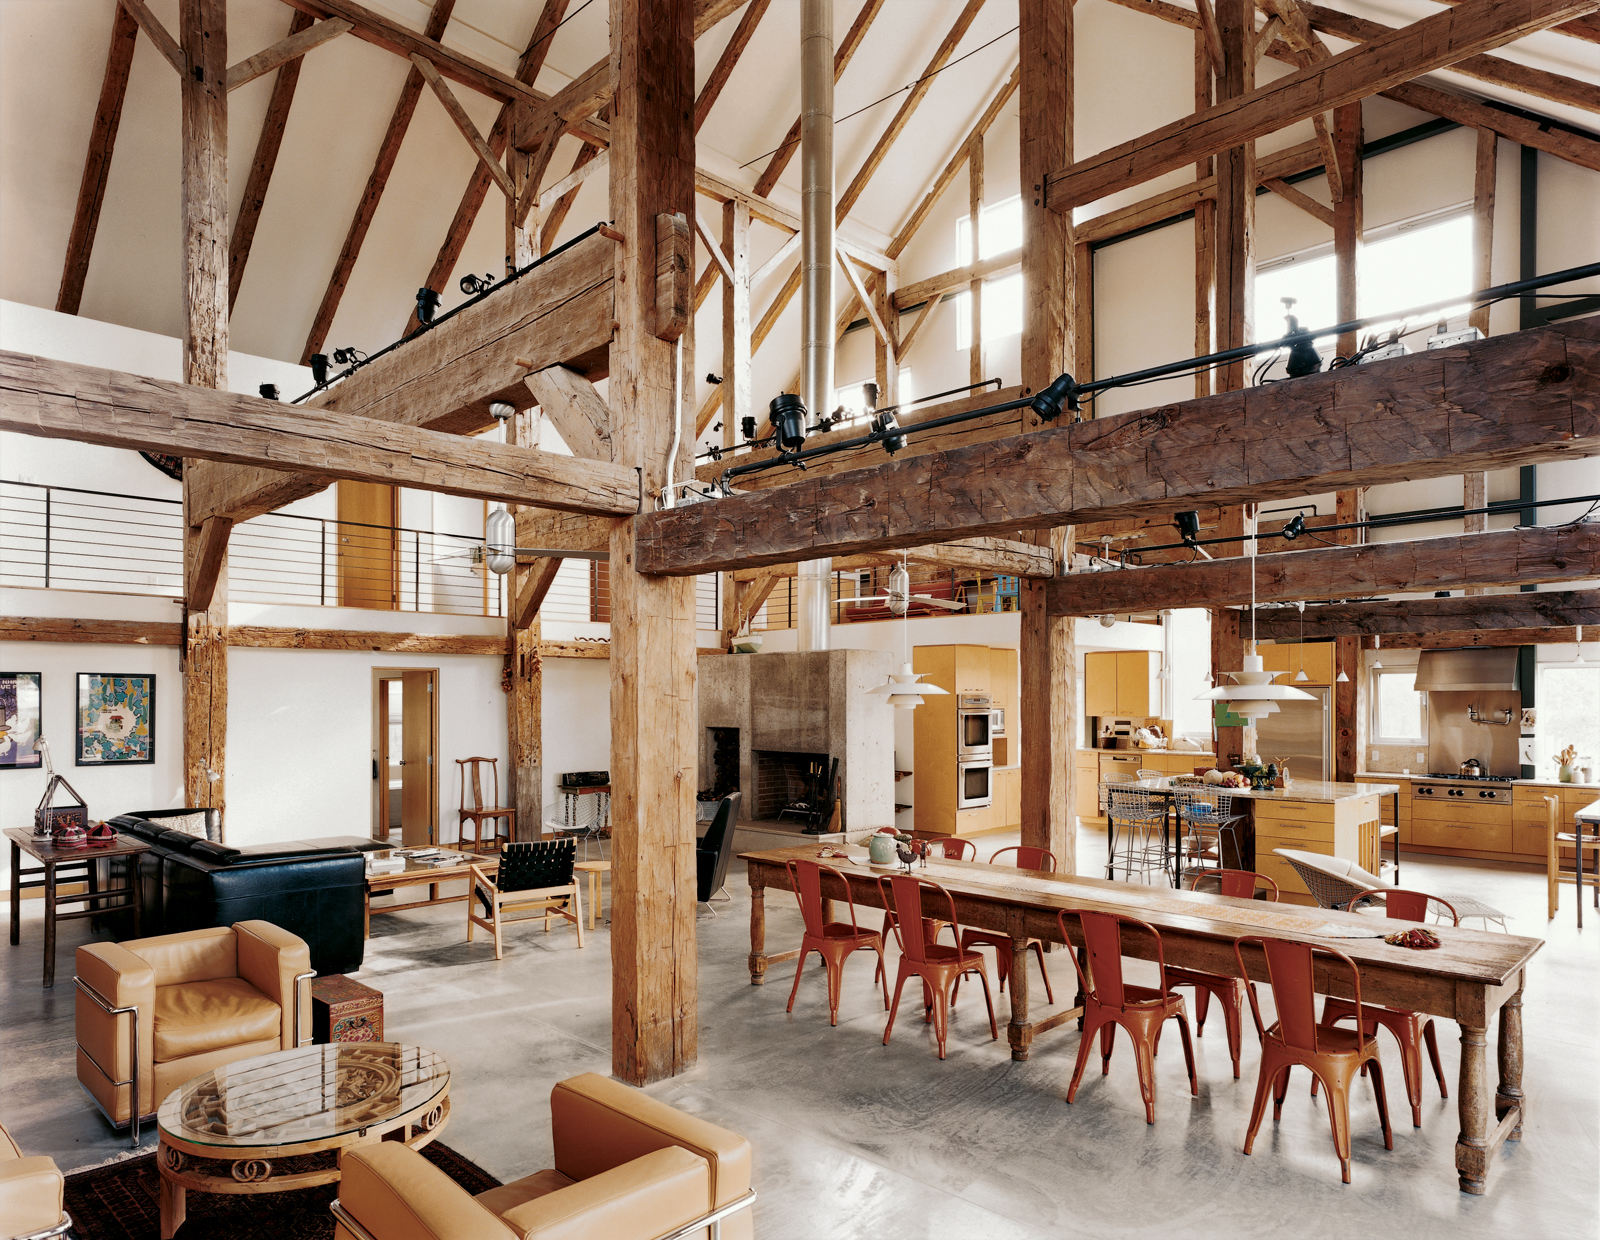 goodman residence dining room gabled ceiling wood beams